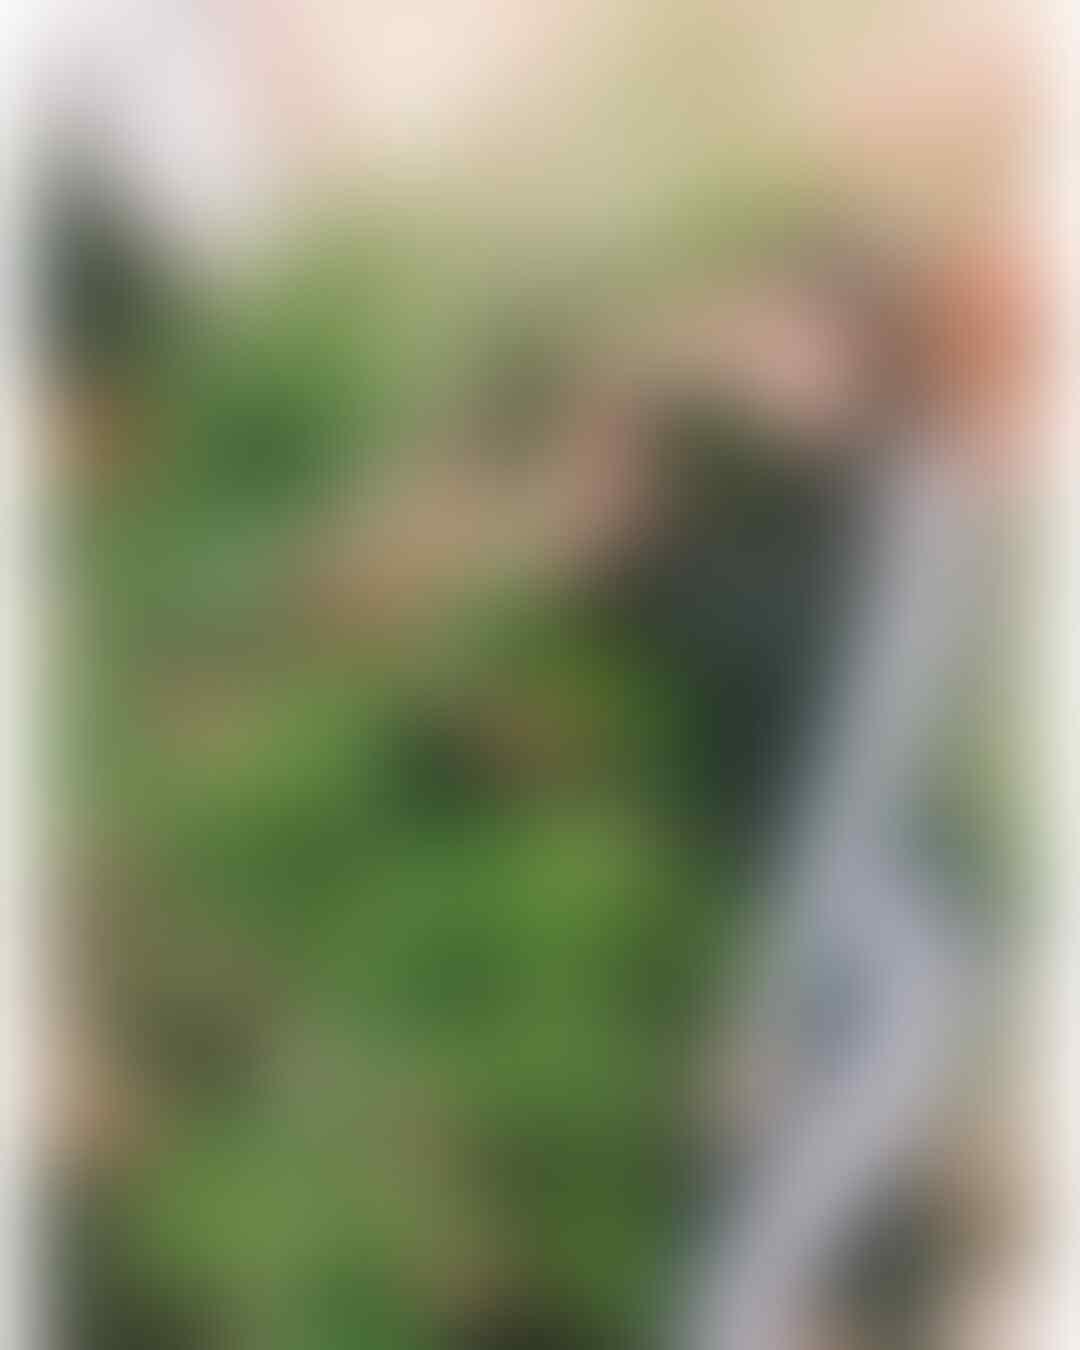 10 Foto Terbaru Pamela Safitri Duo Serigala, Bikin Susah Fokus